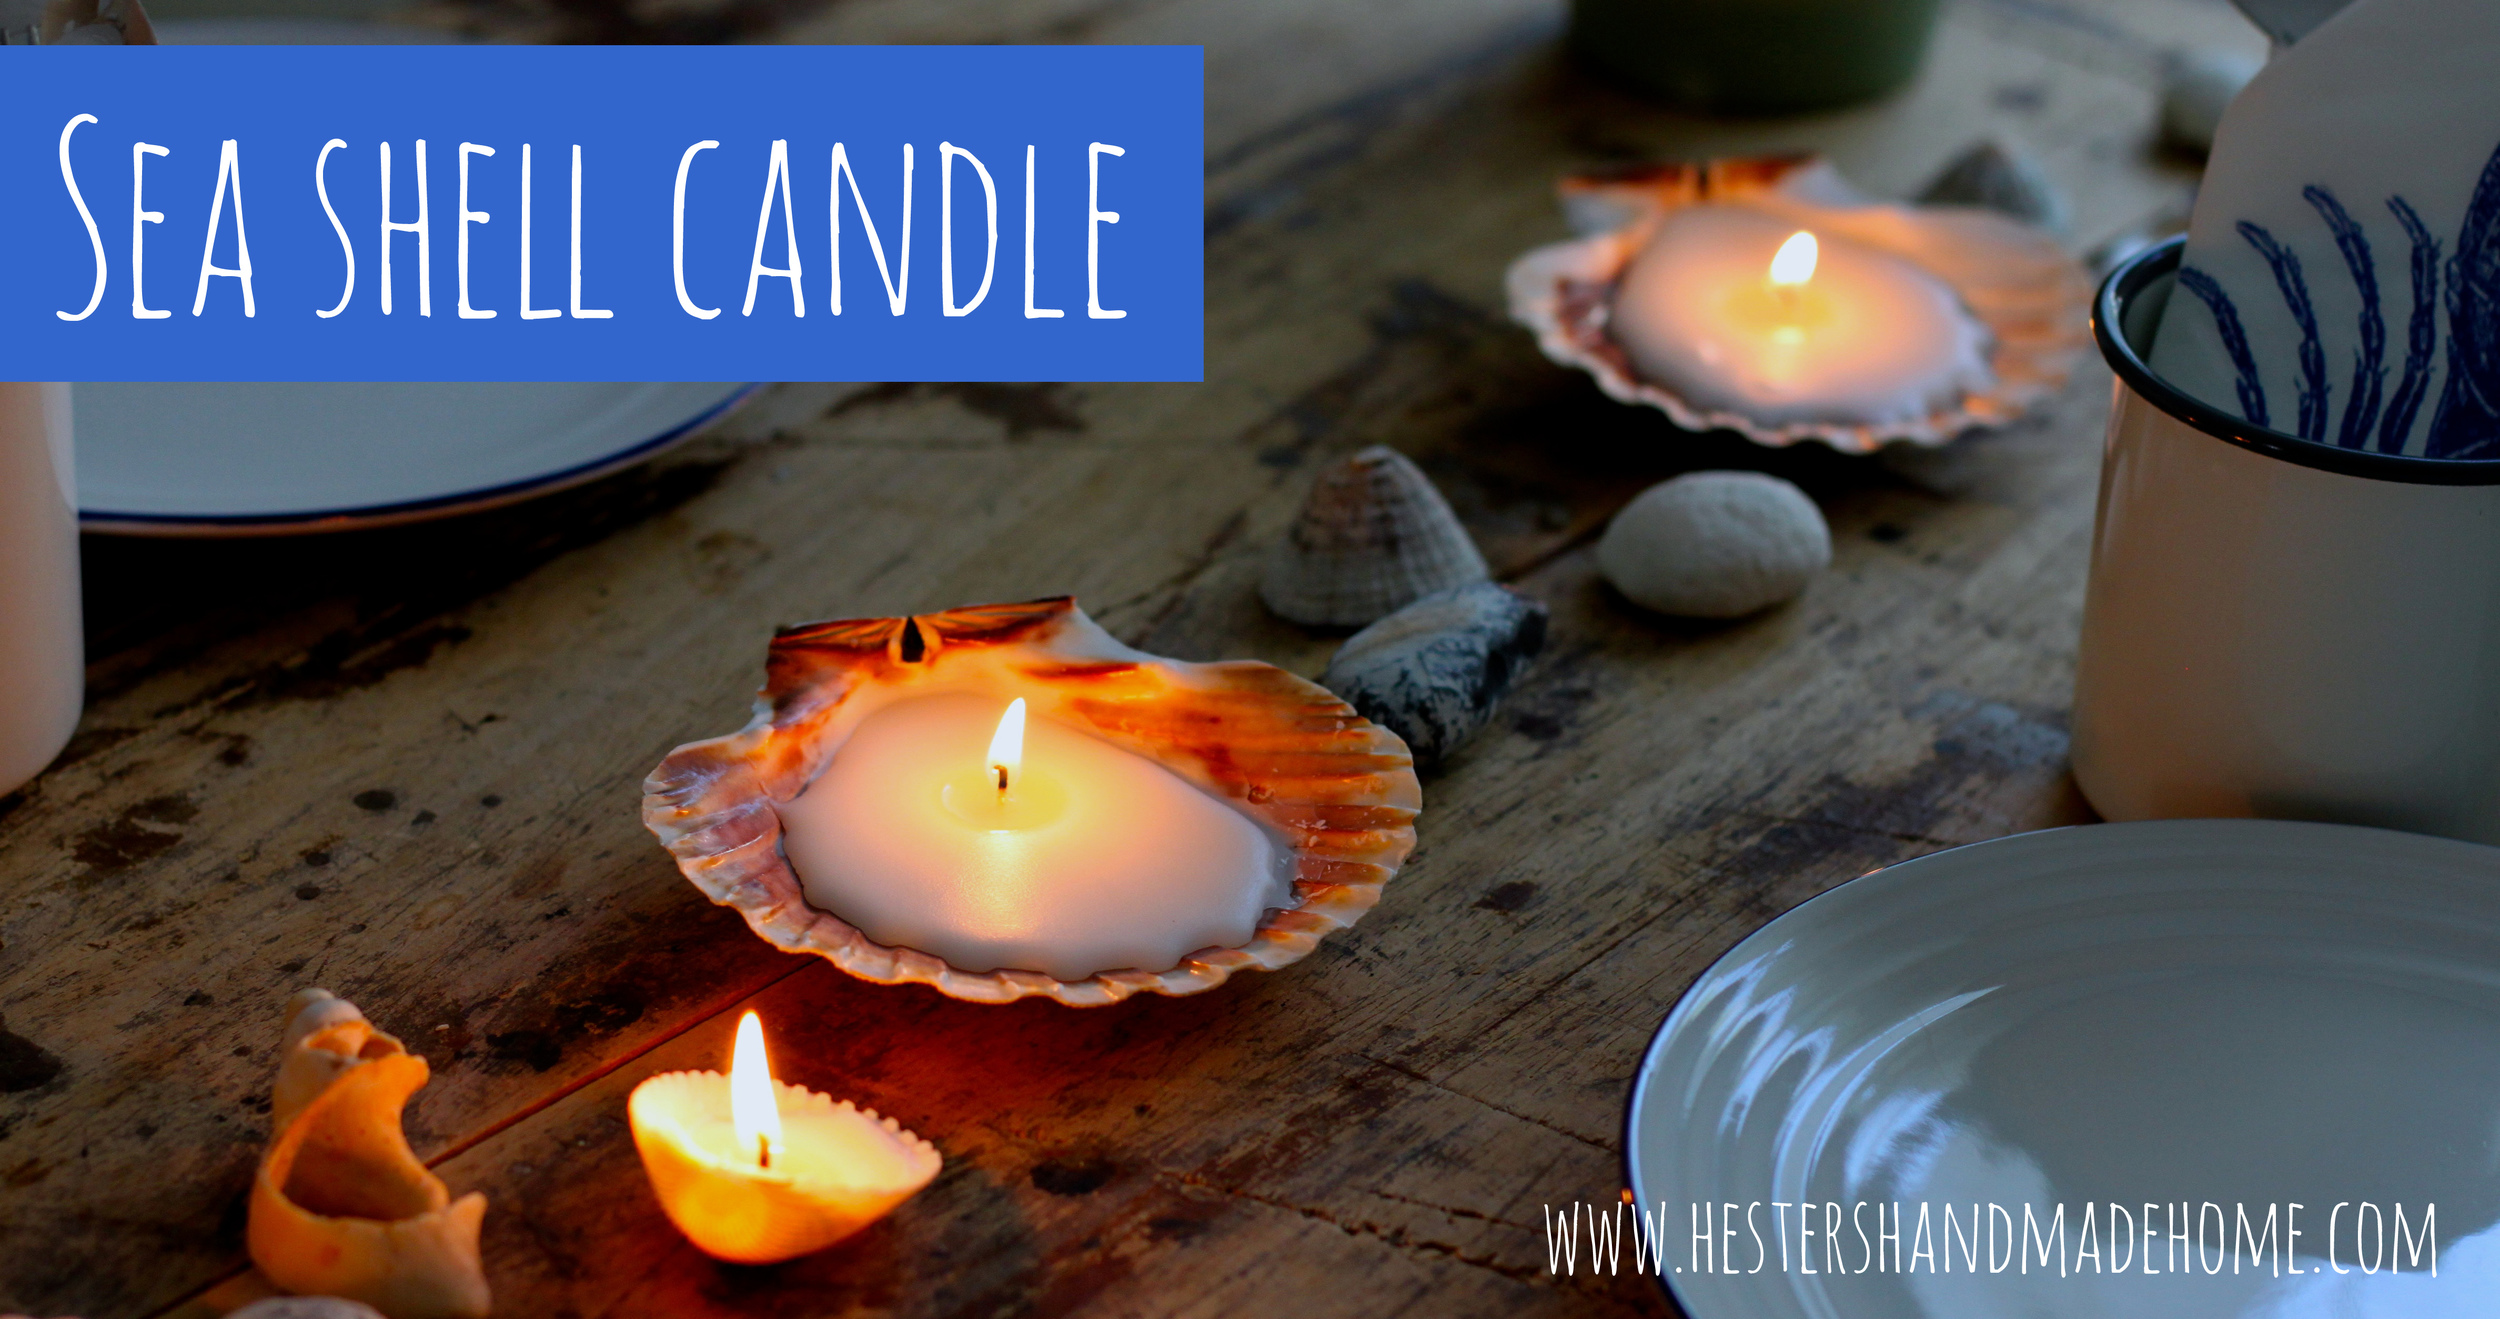 sea shell candle.jpg